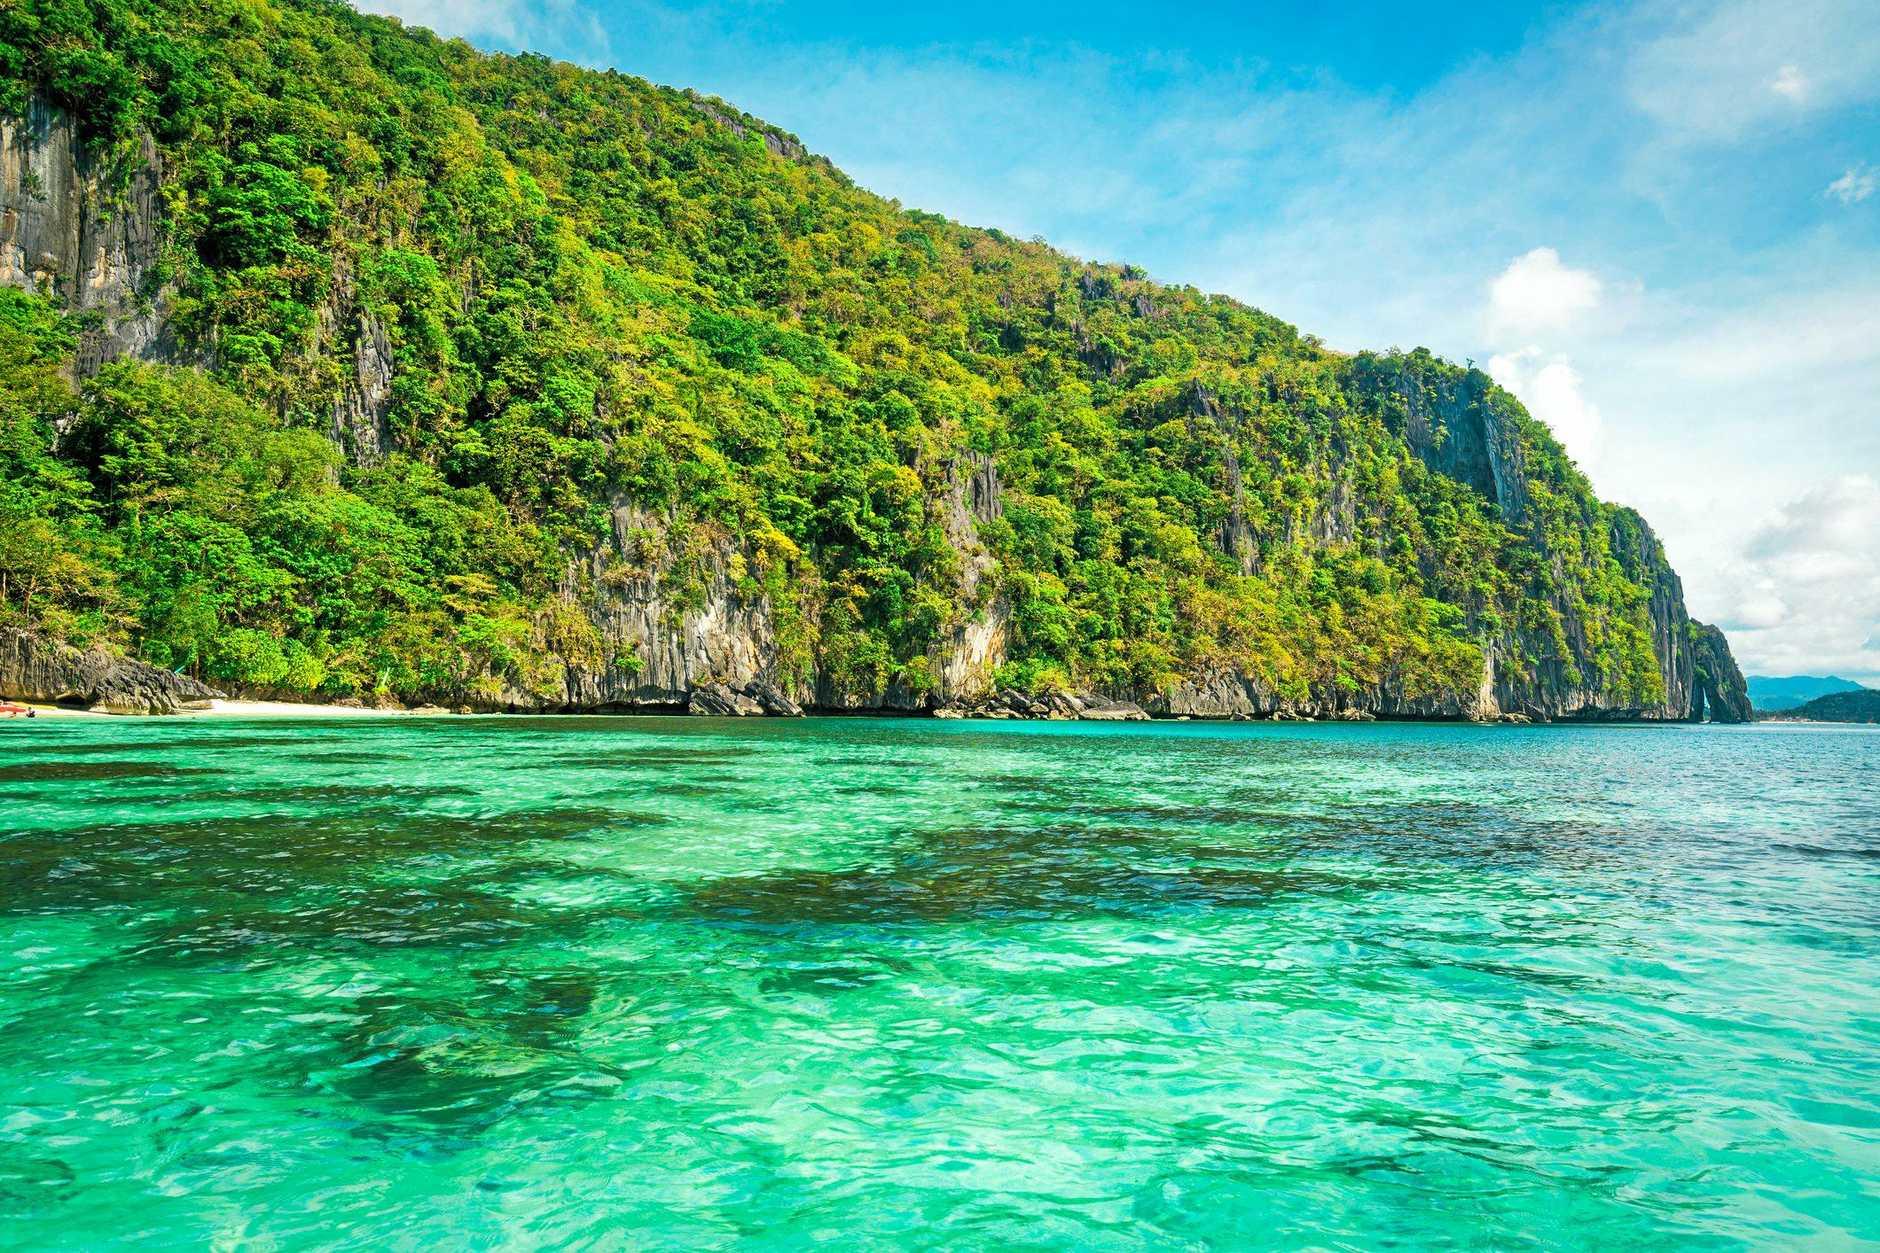 TOP ASIAN BEACH: The scenic Hidden Beach, El Nido Palawan, Philippines.